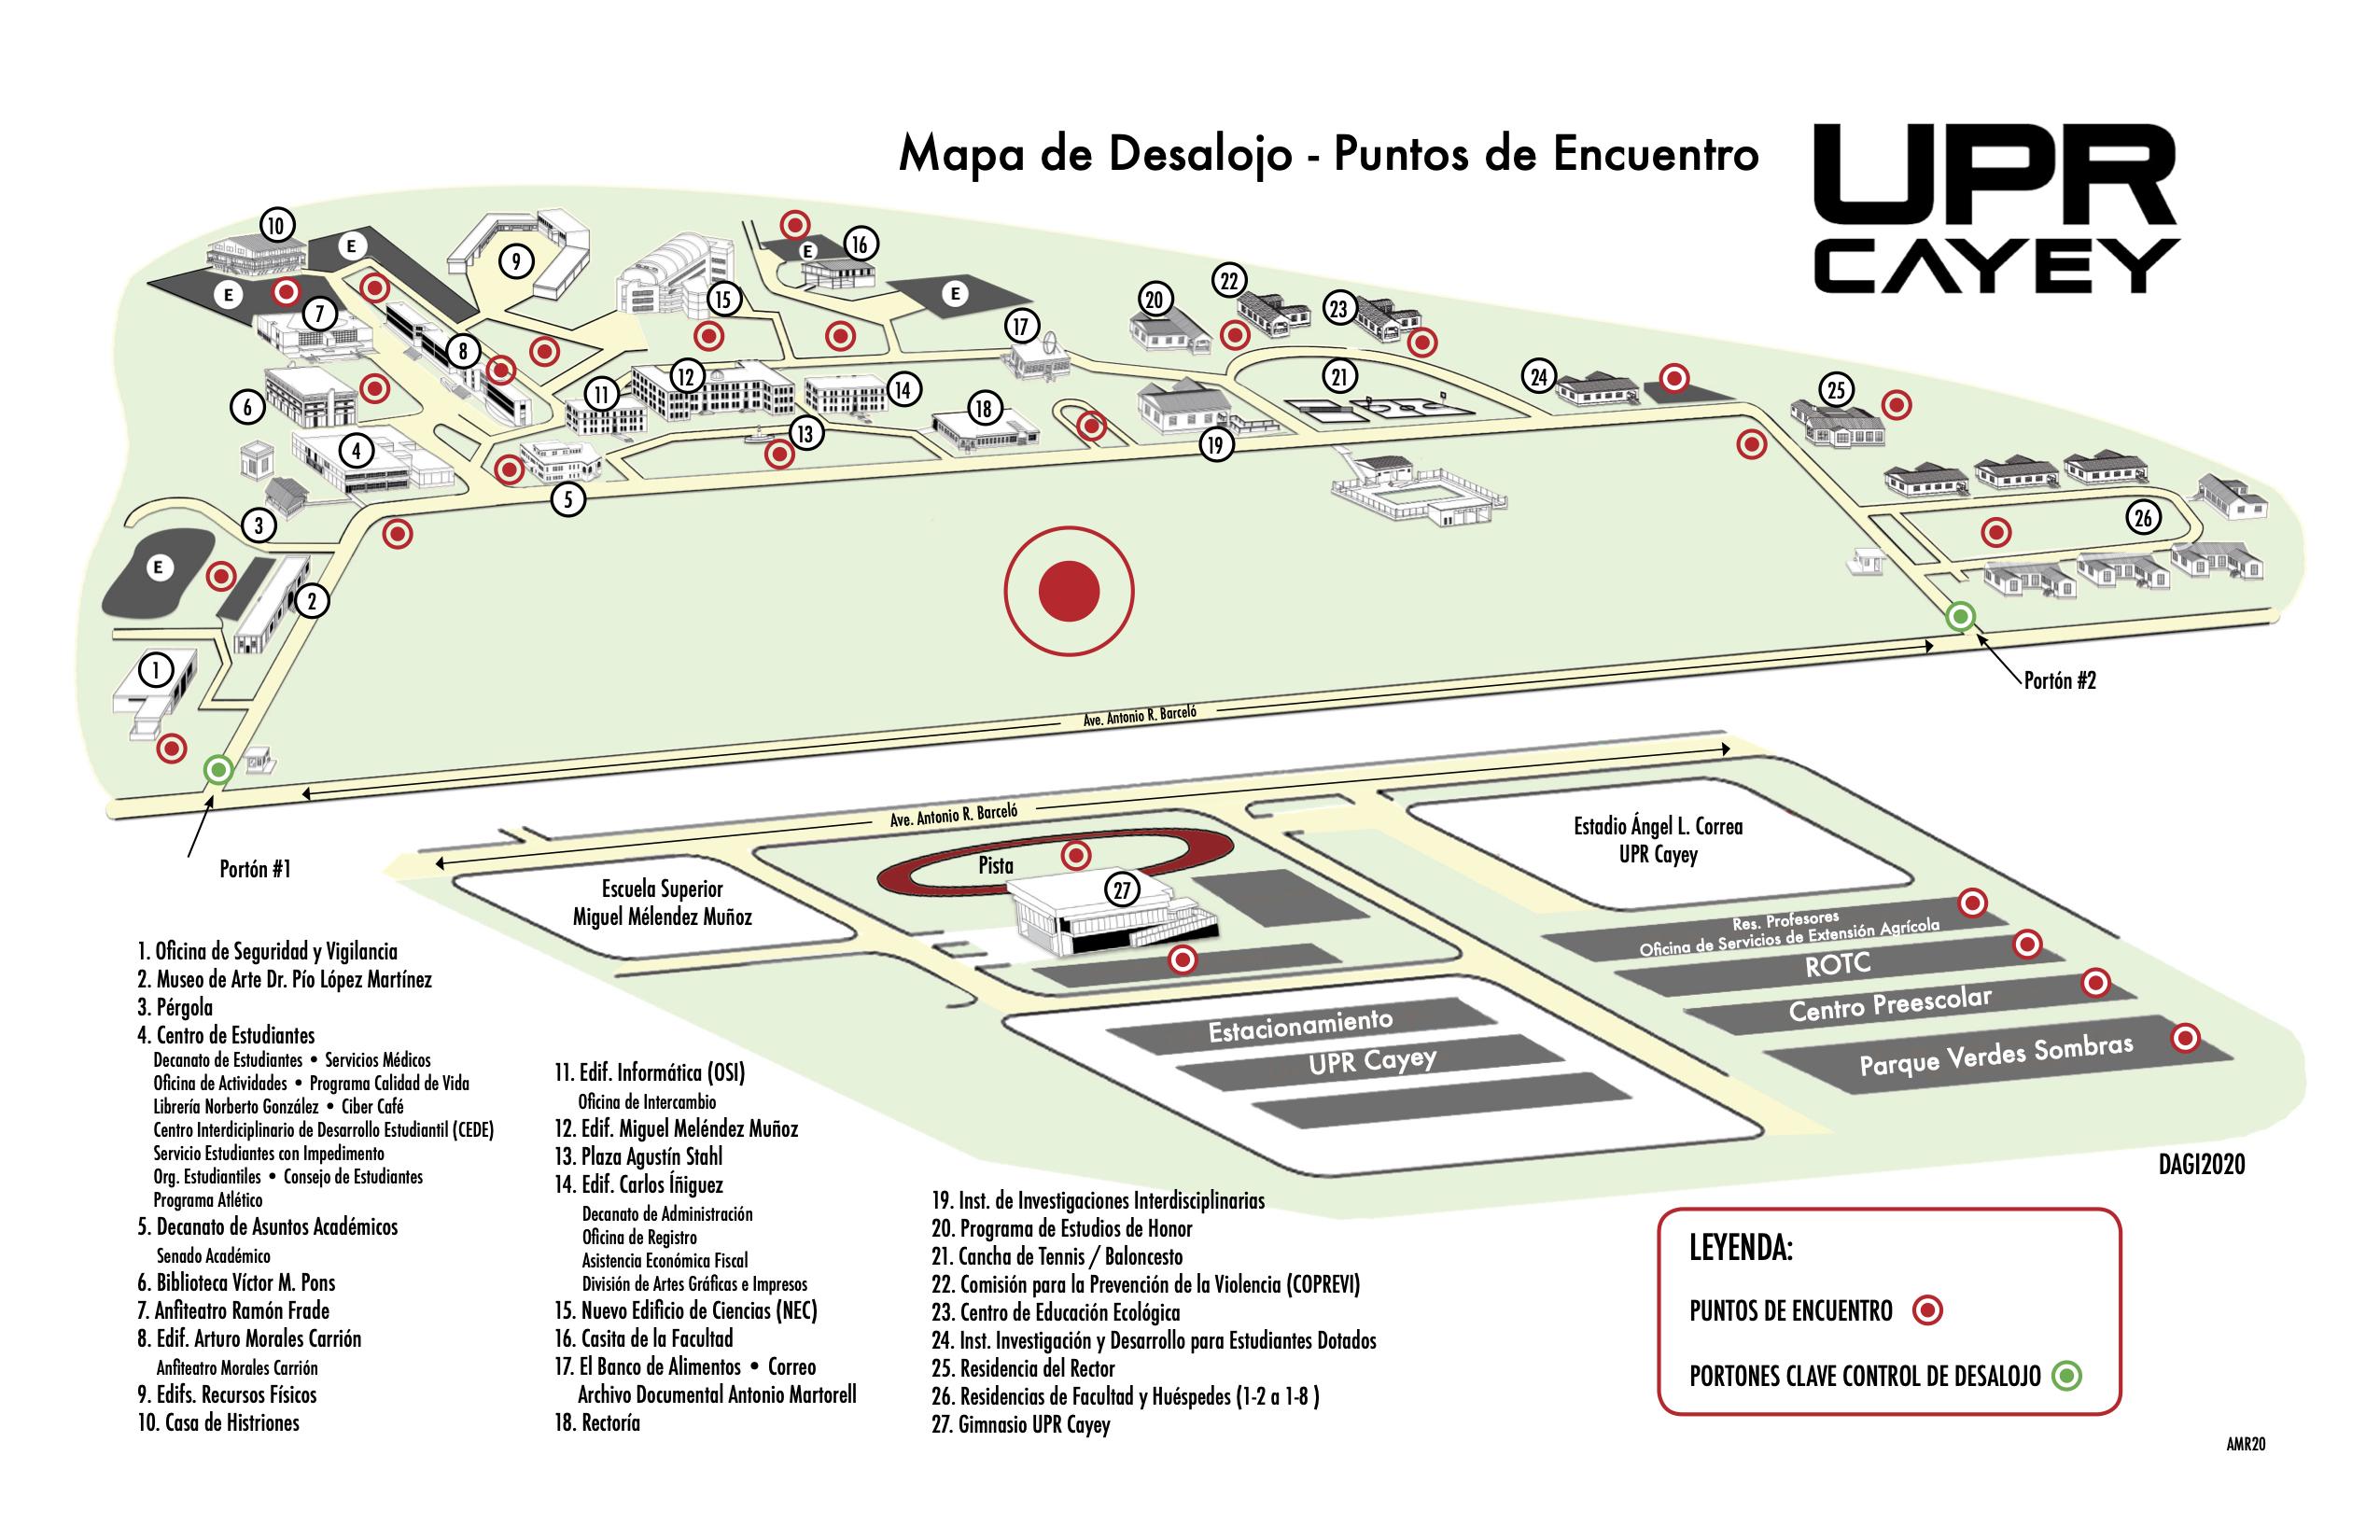 Imagen mapa de desalojo UPR Cayey